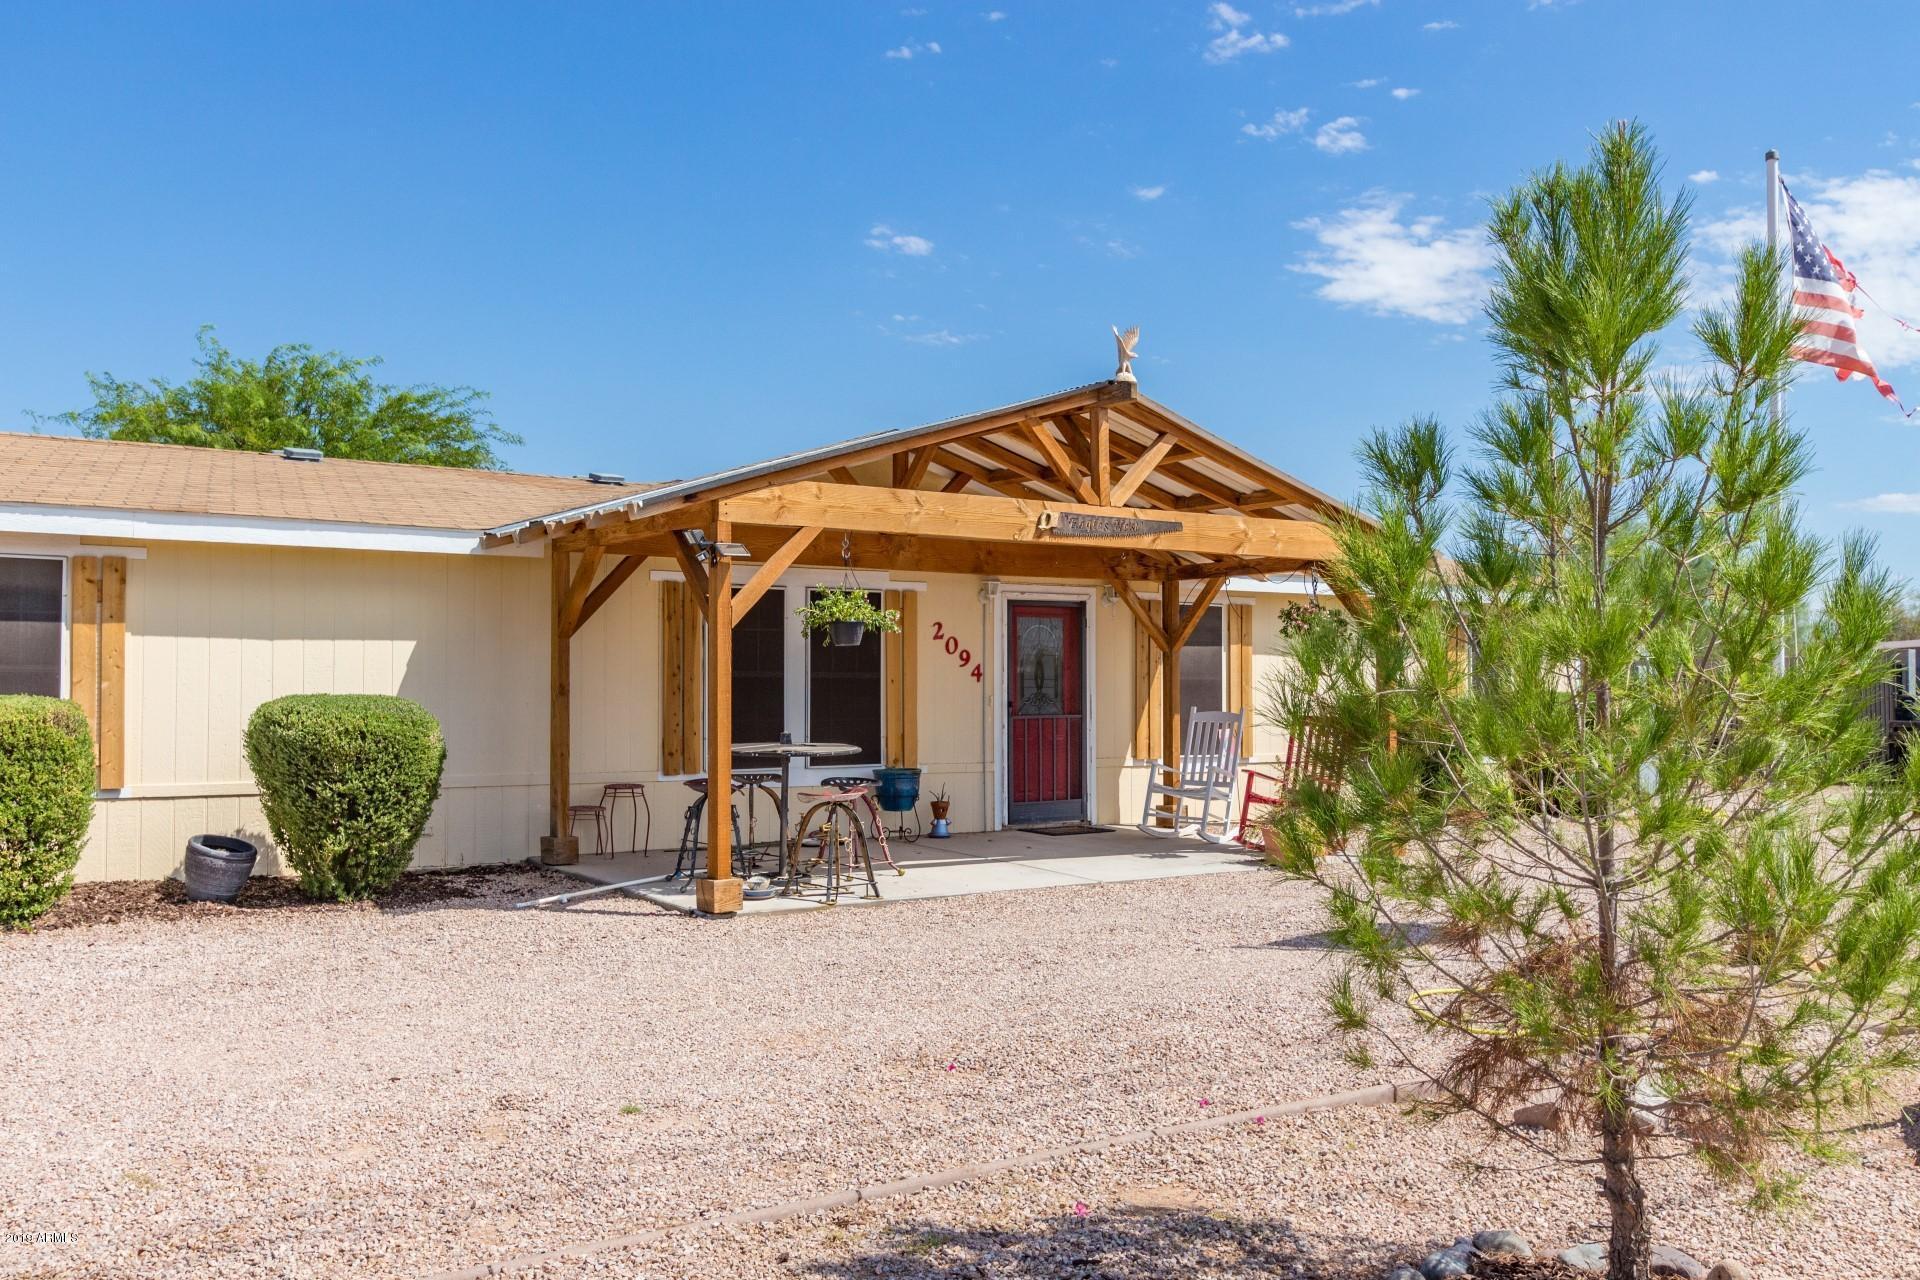 Photo of 2094 W SHIPROCK Street, Apache Junction, AZ 85120